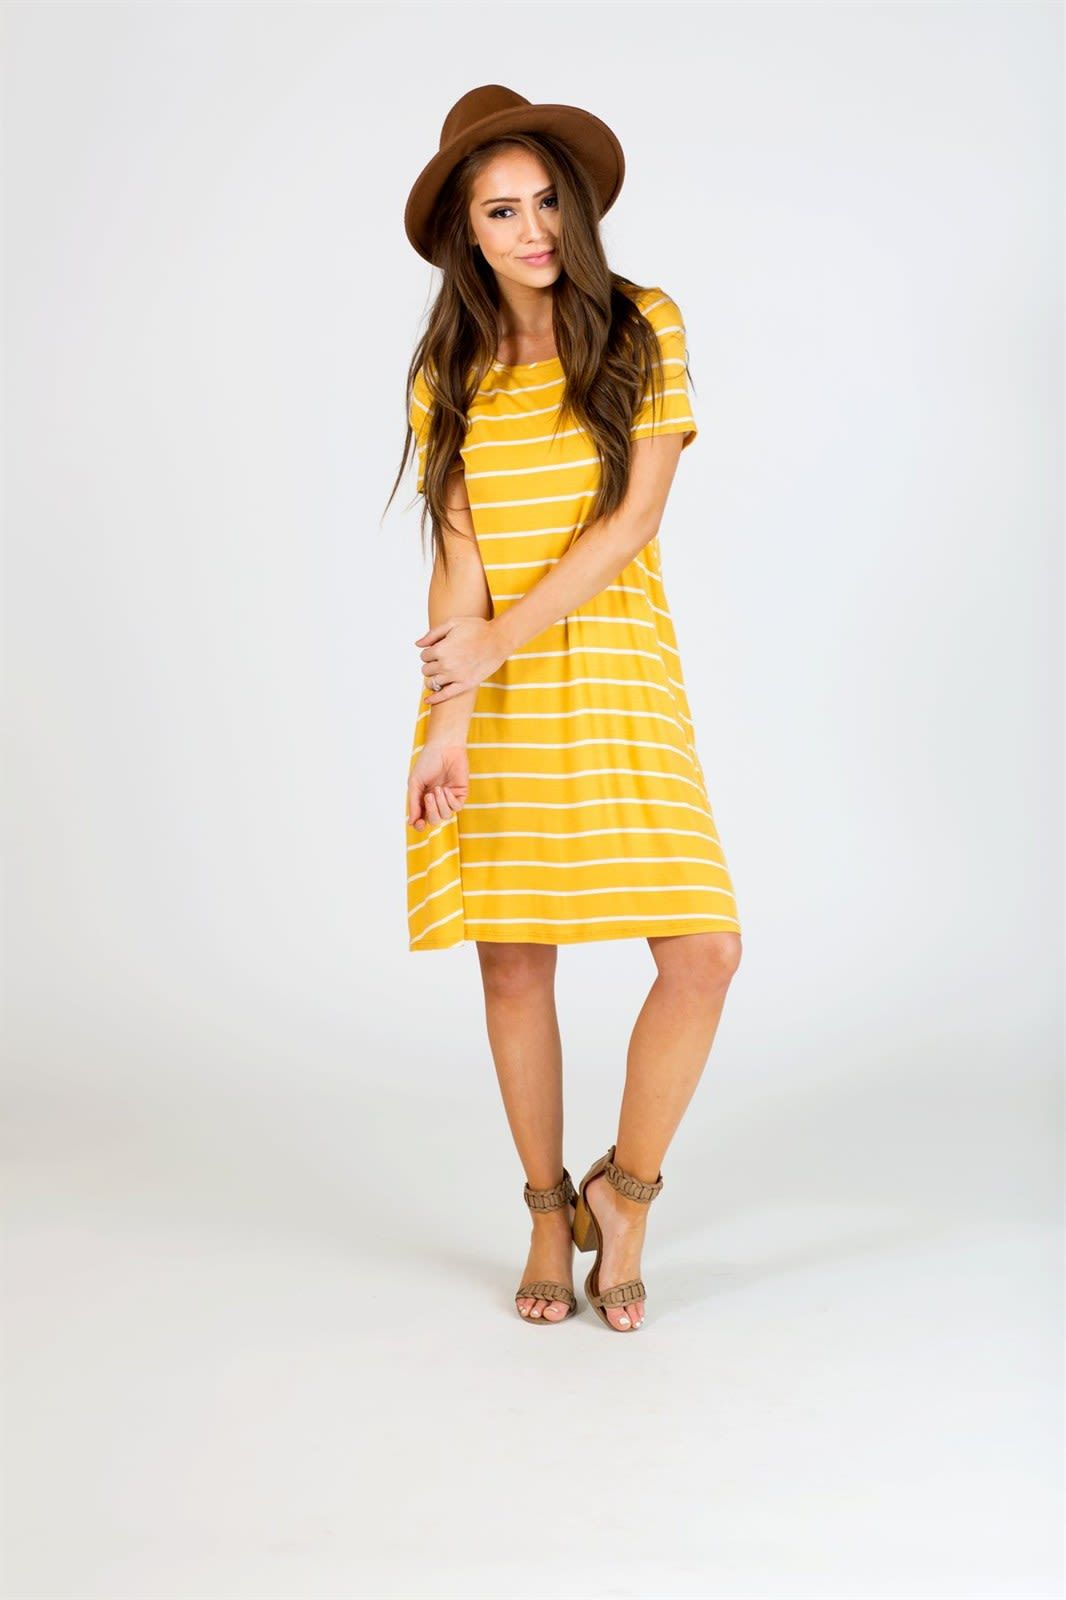 Striped Pocket Swing Dress Modest Spring Dresses Swing Dress Summer Swing Dresses [ 1600 x 1066 Pixel ]